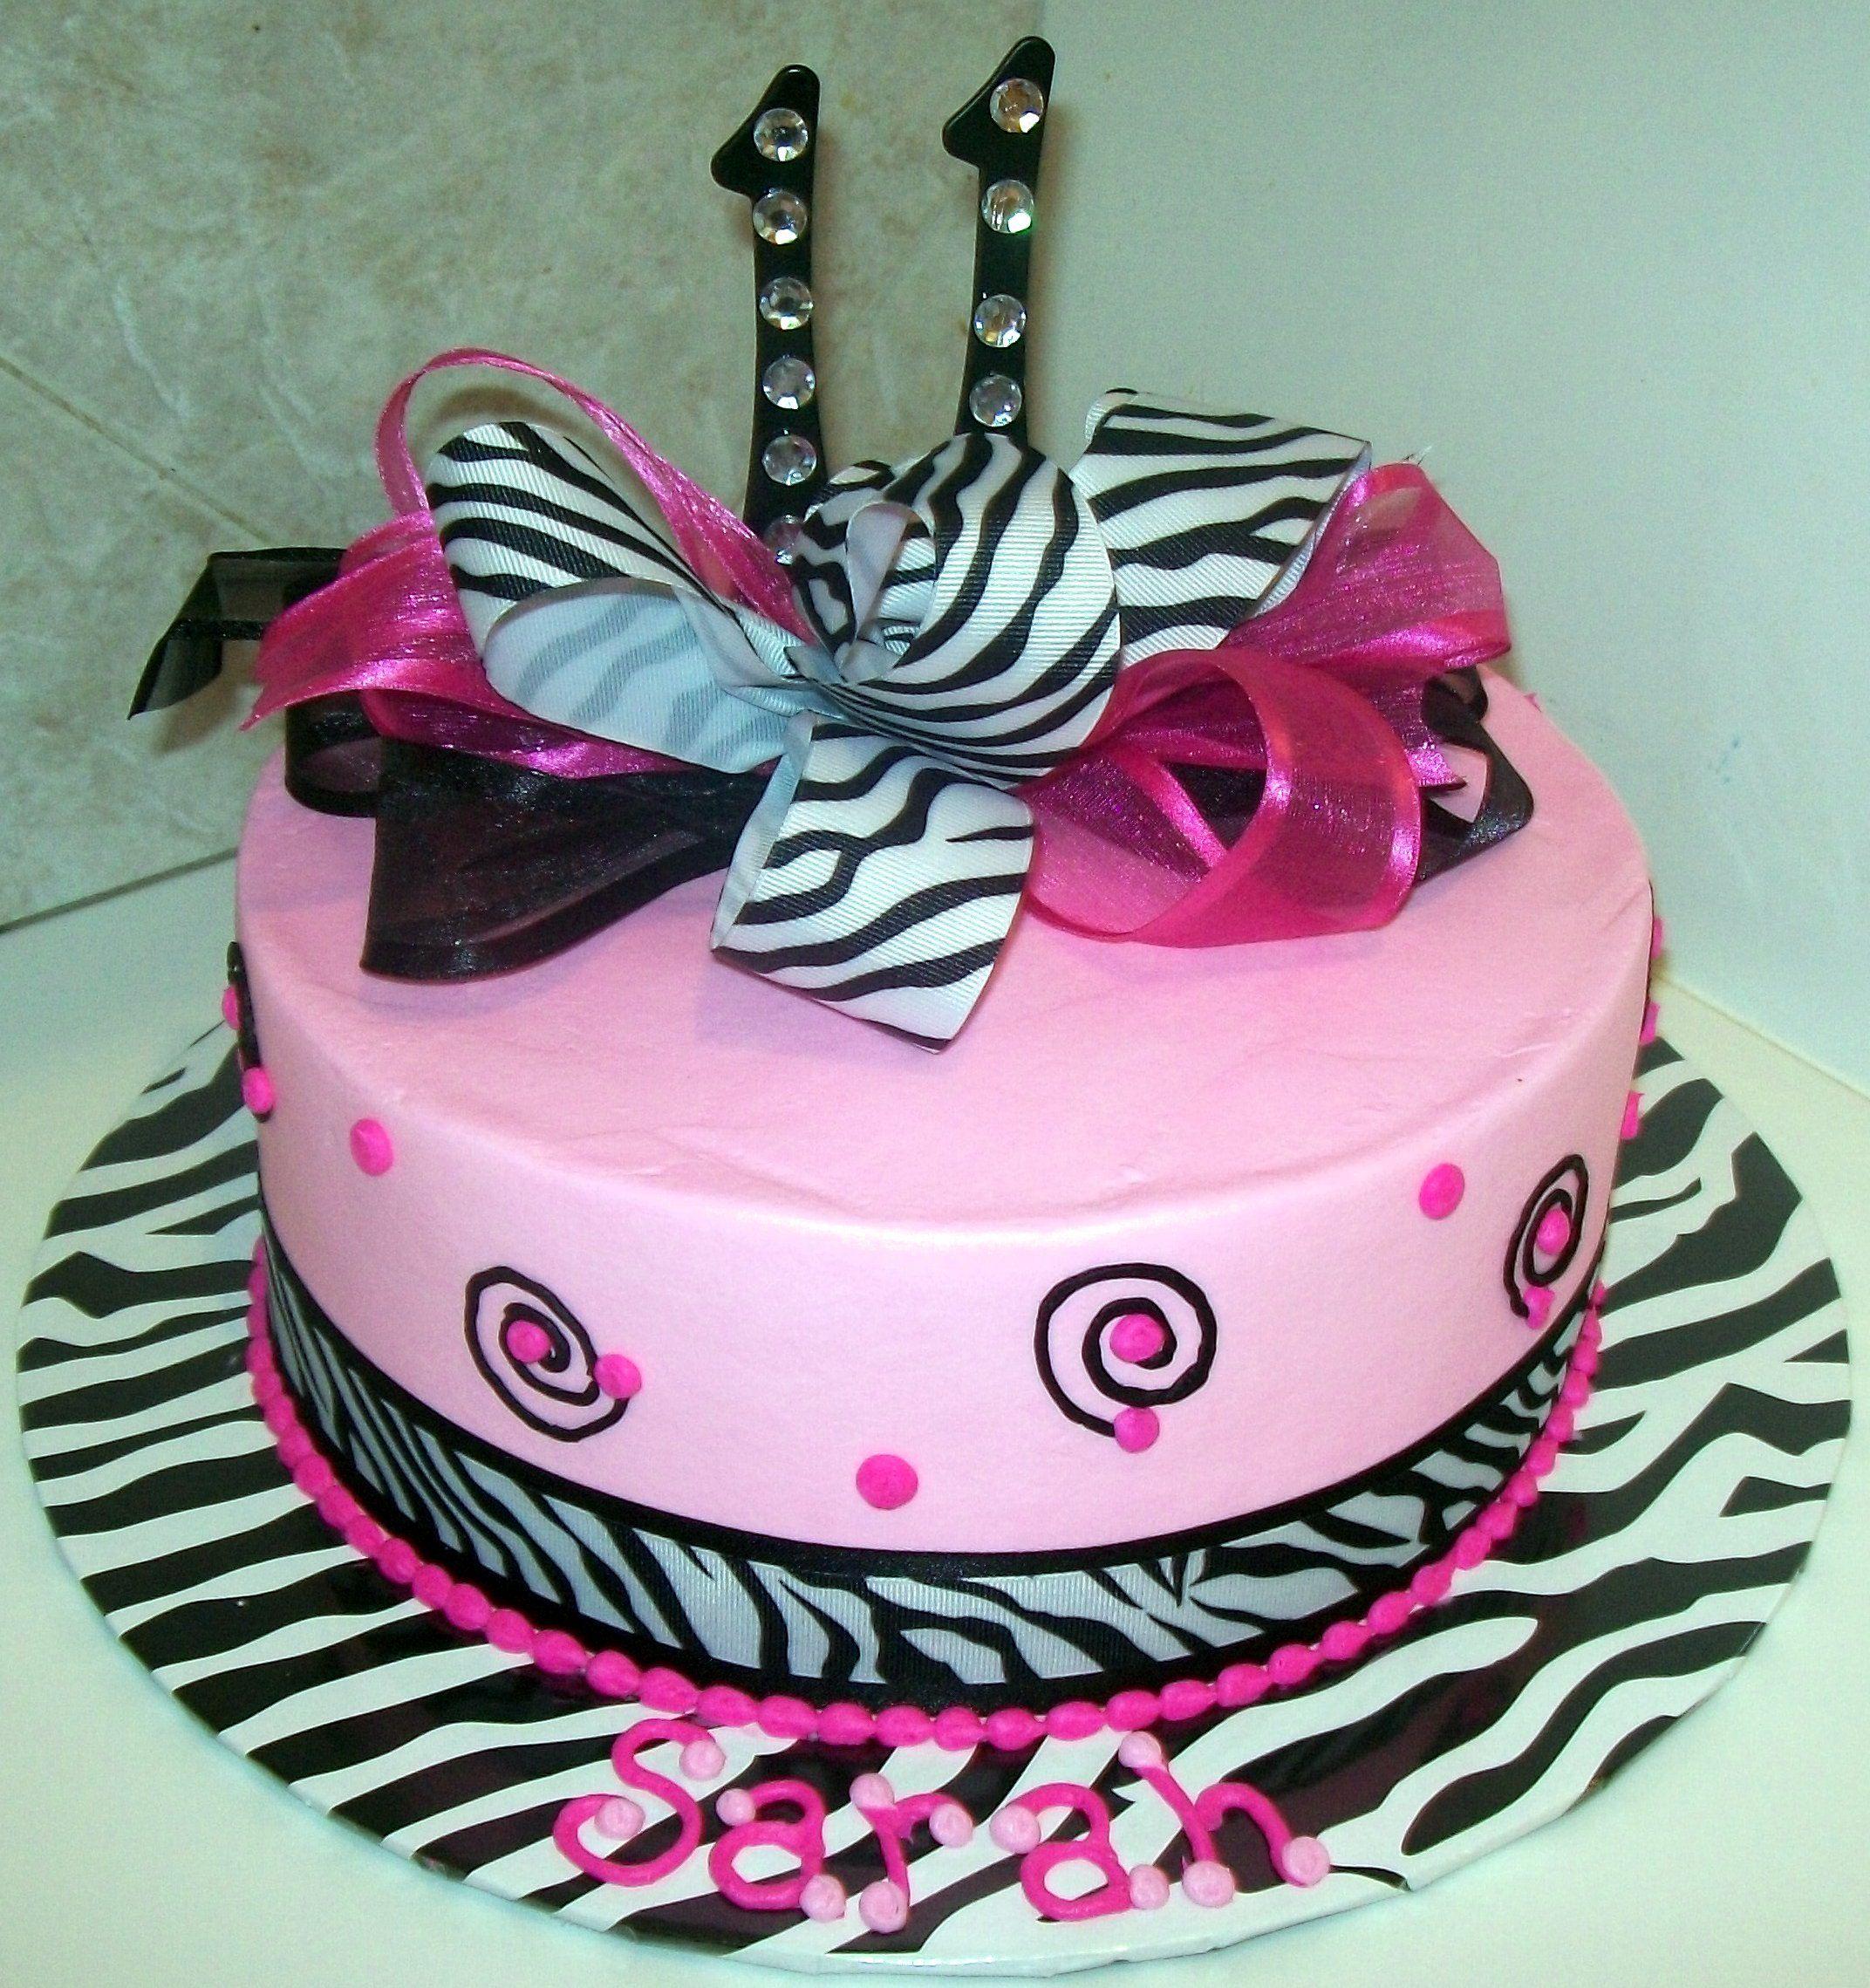 Crown Birthday Cake Birthday Cake Girls Girl Cakes Pink Birthday Cakes